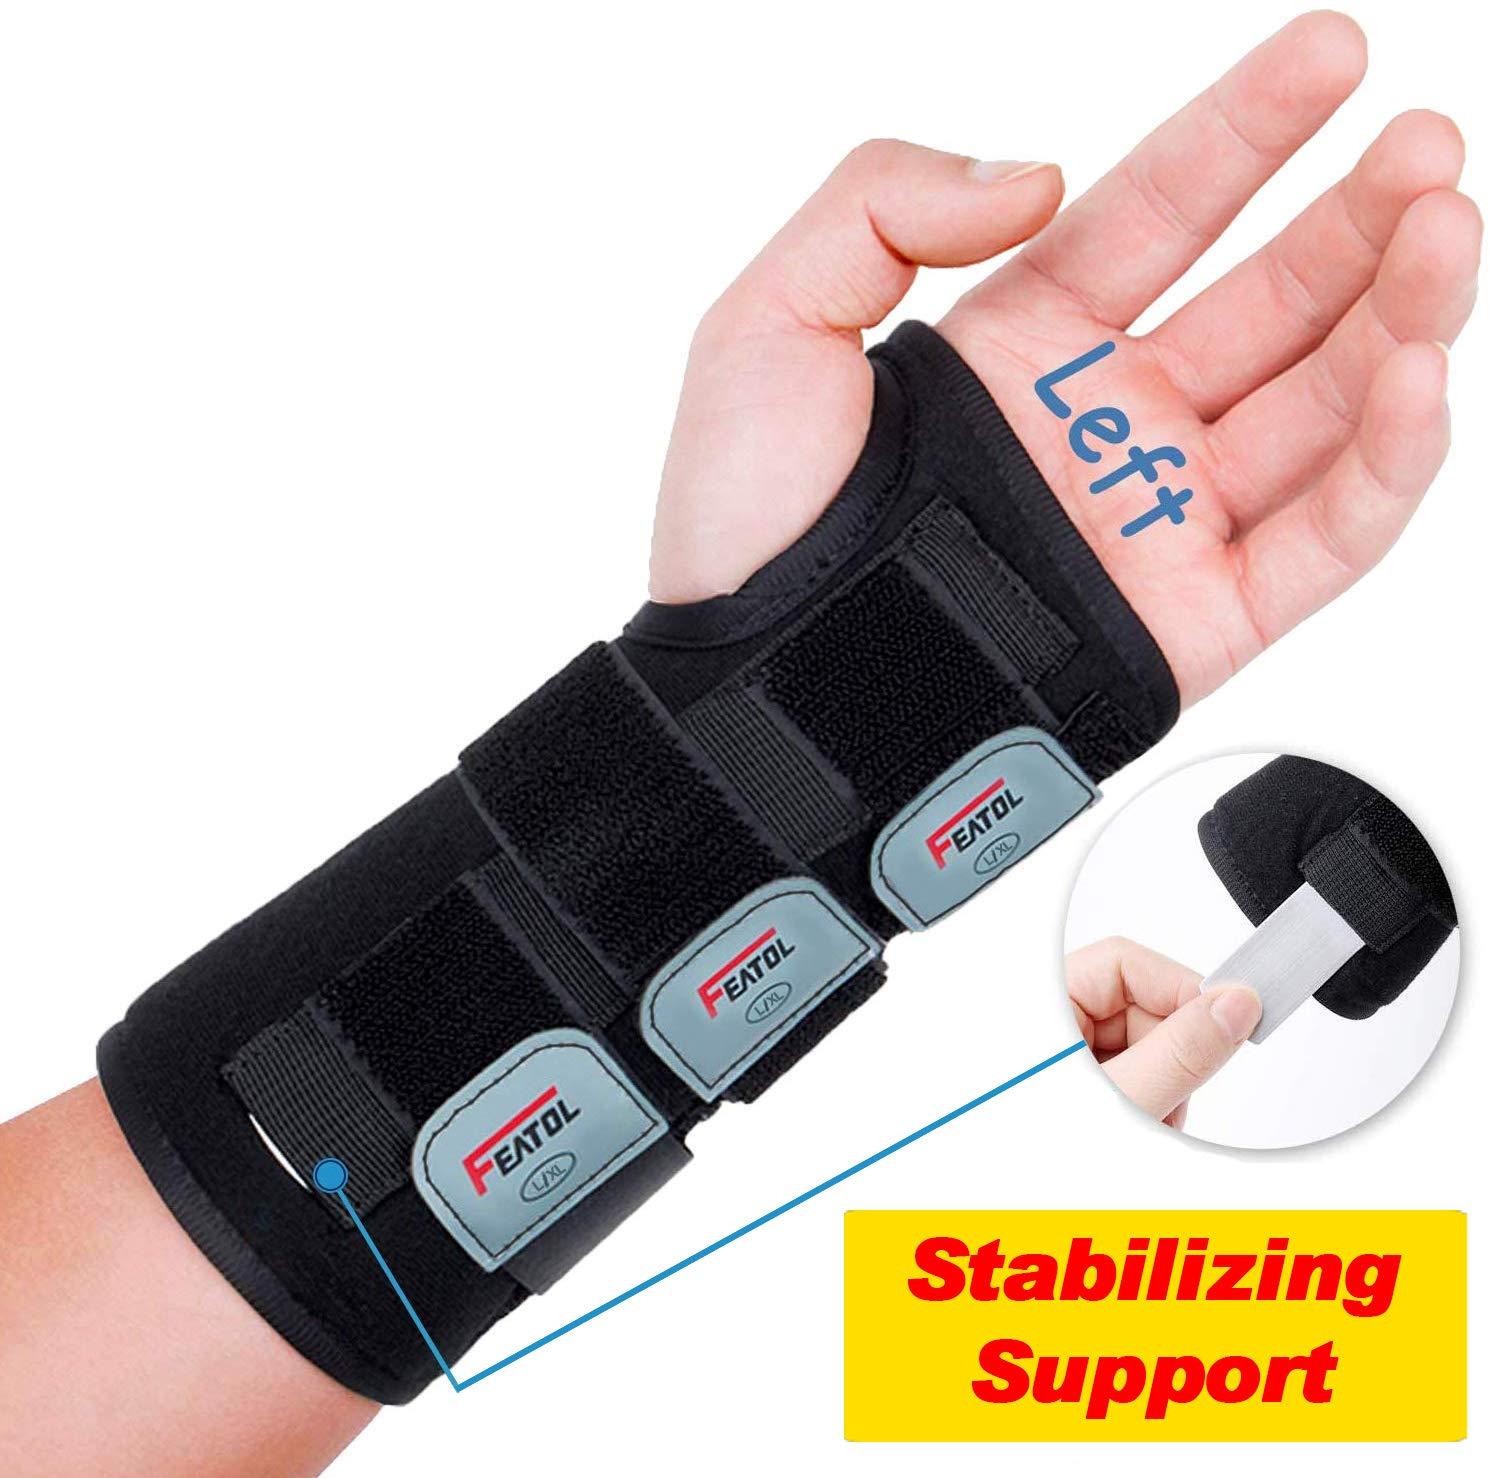 Adjustable Support Splints Compression Injuries